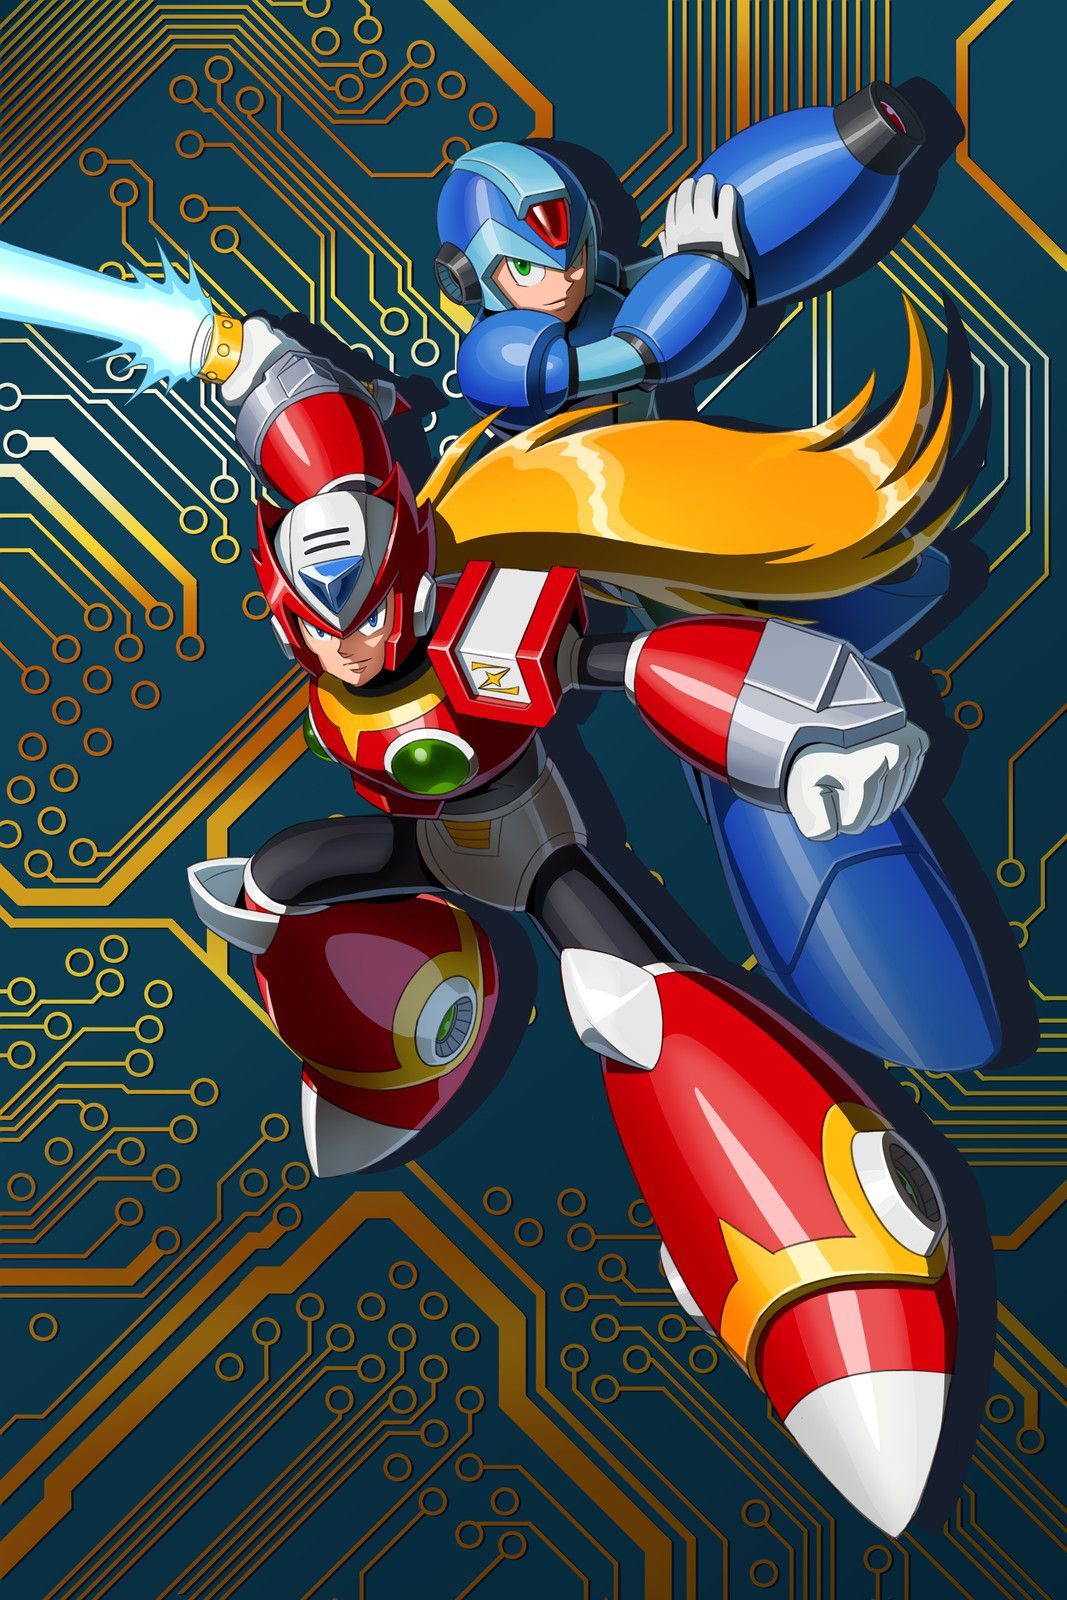 Megaman And Zero By William Liu On Artstation Mega Man Art Mega Man Video Game Characters